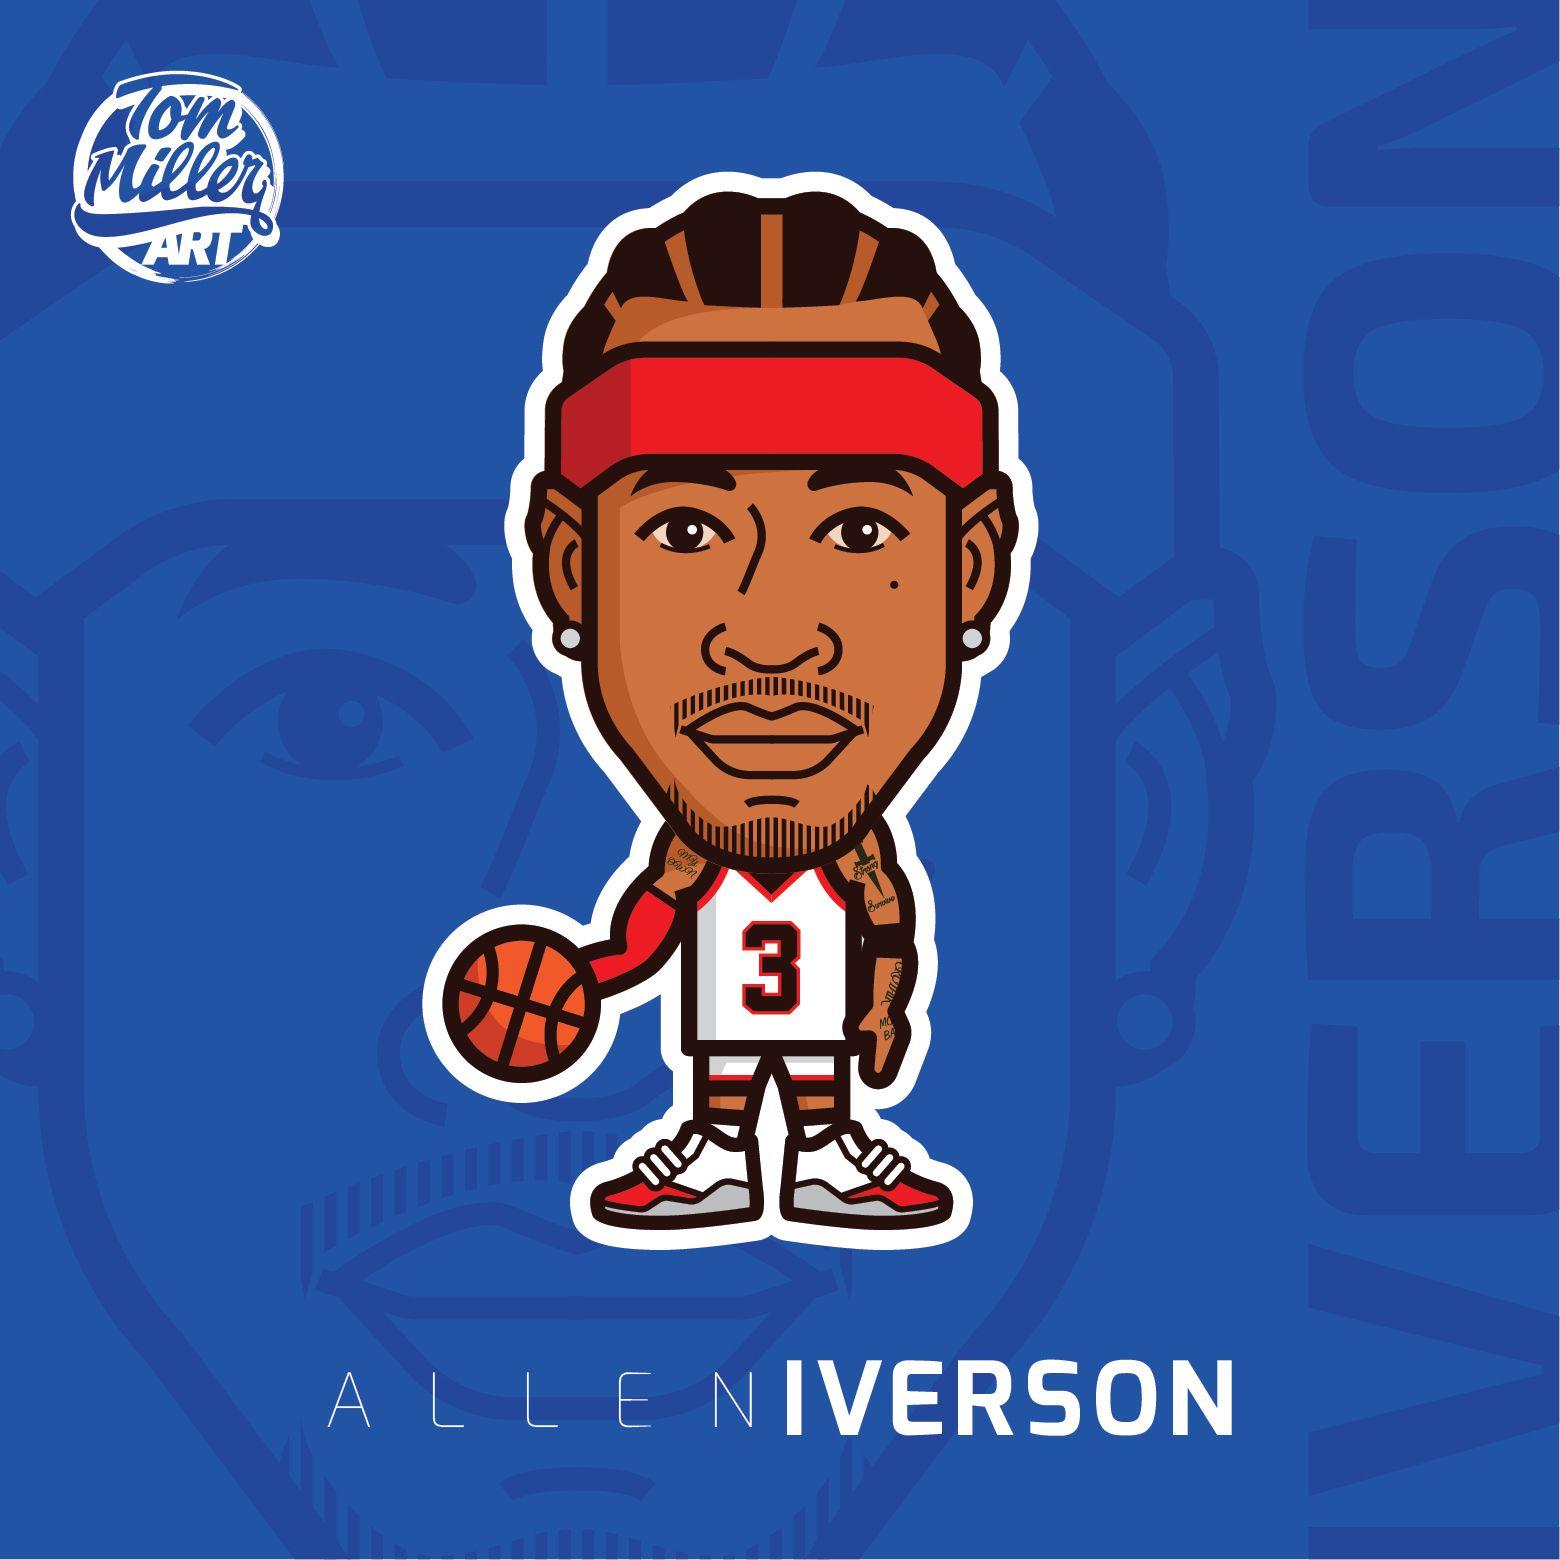 Allen Iverson Cartoon allen iverson alleniverson nba